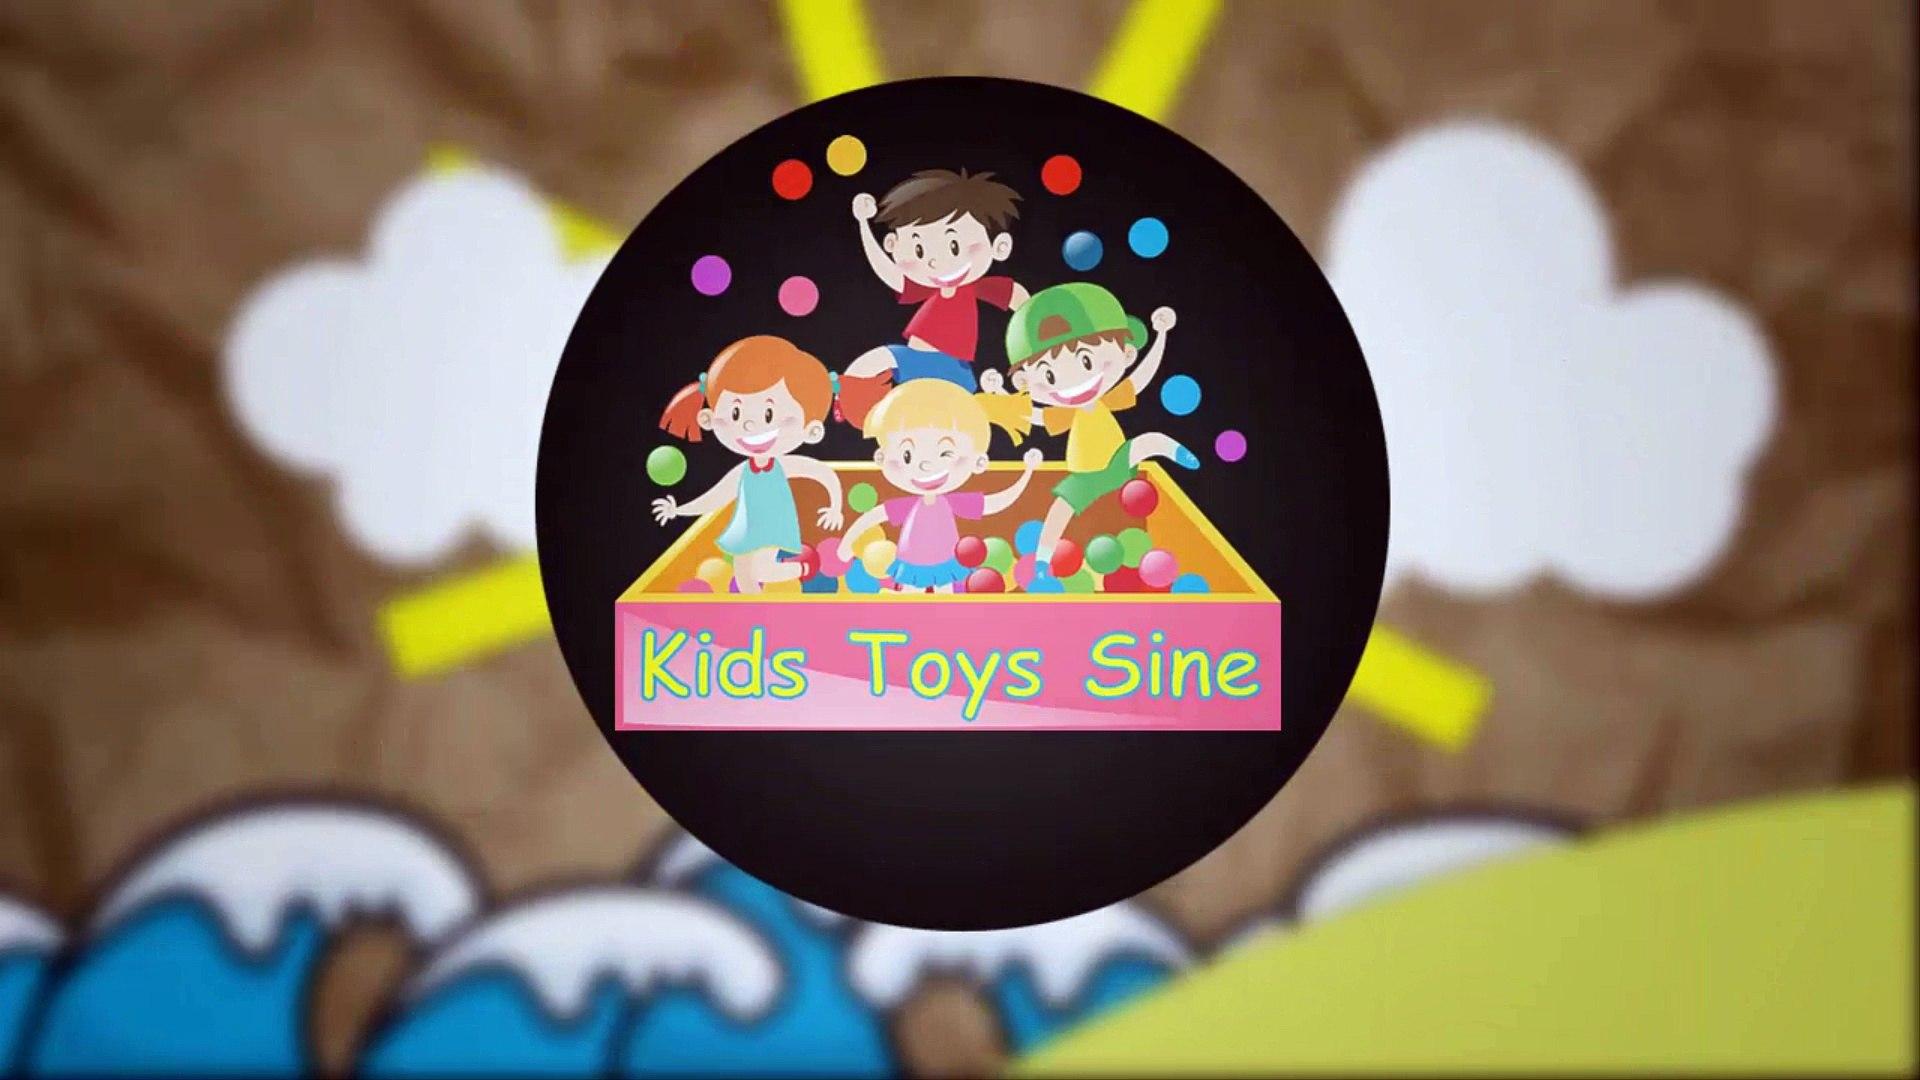 Days Of The Week Song | Kids Songs | Kids Toys Sine